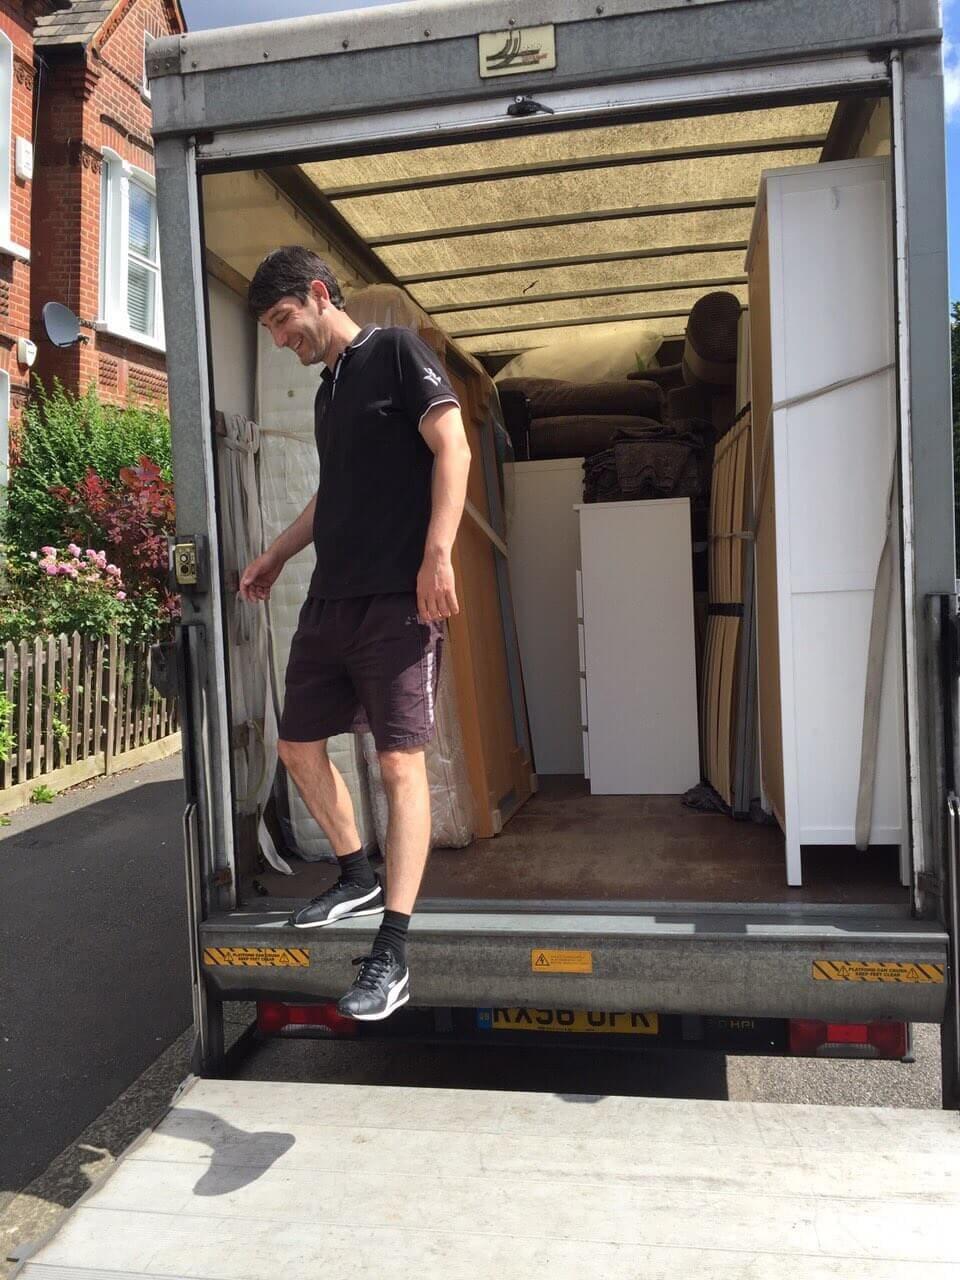 van removals Paddington